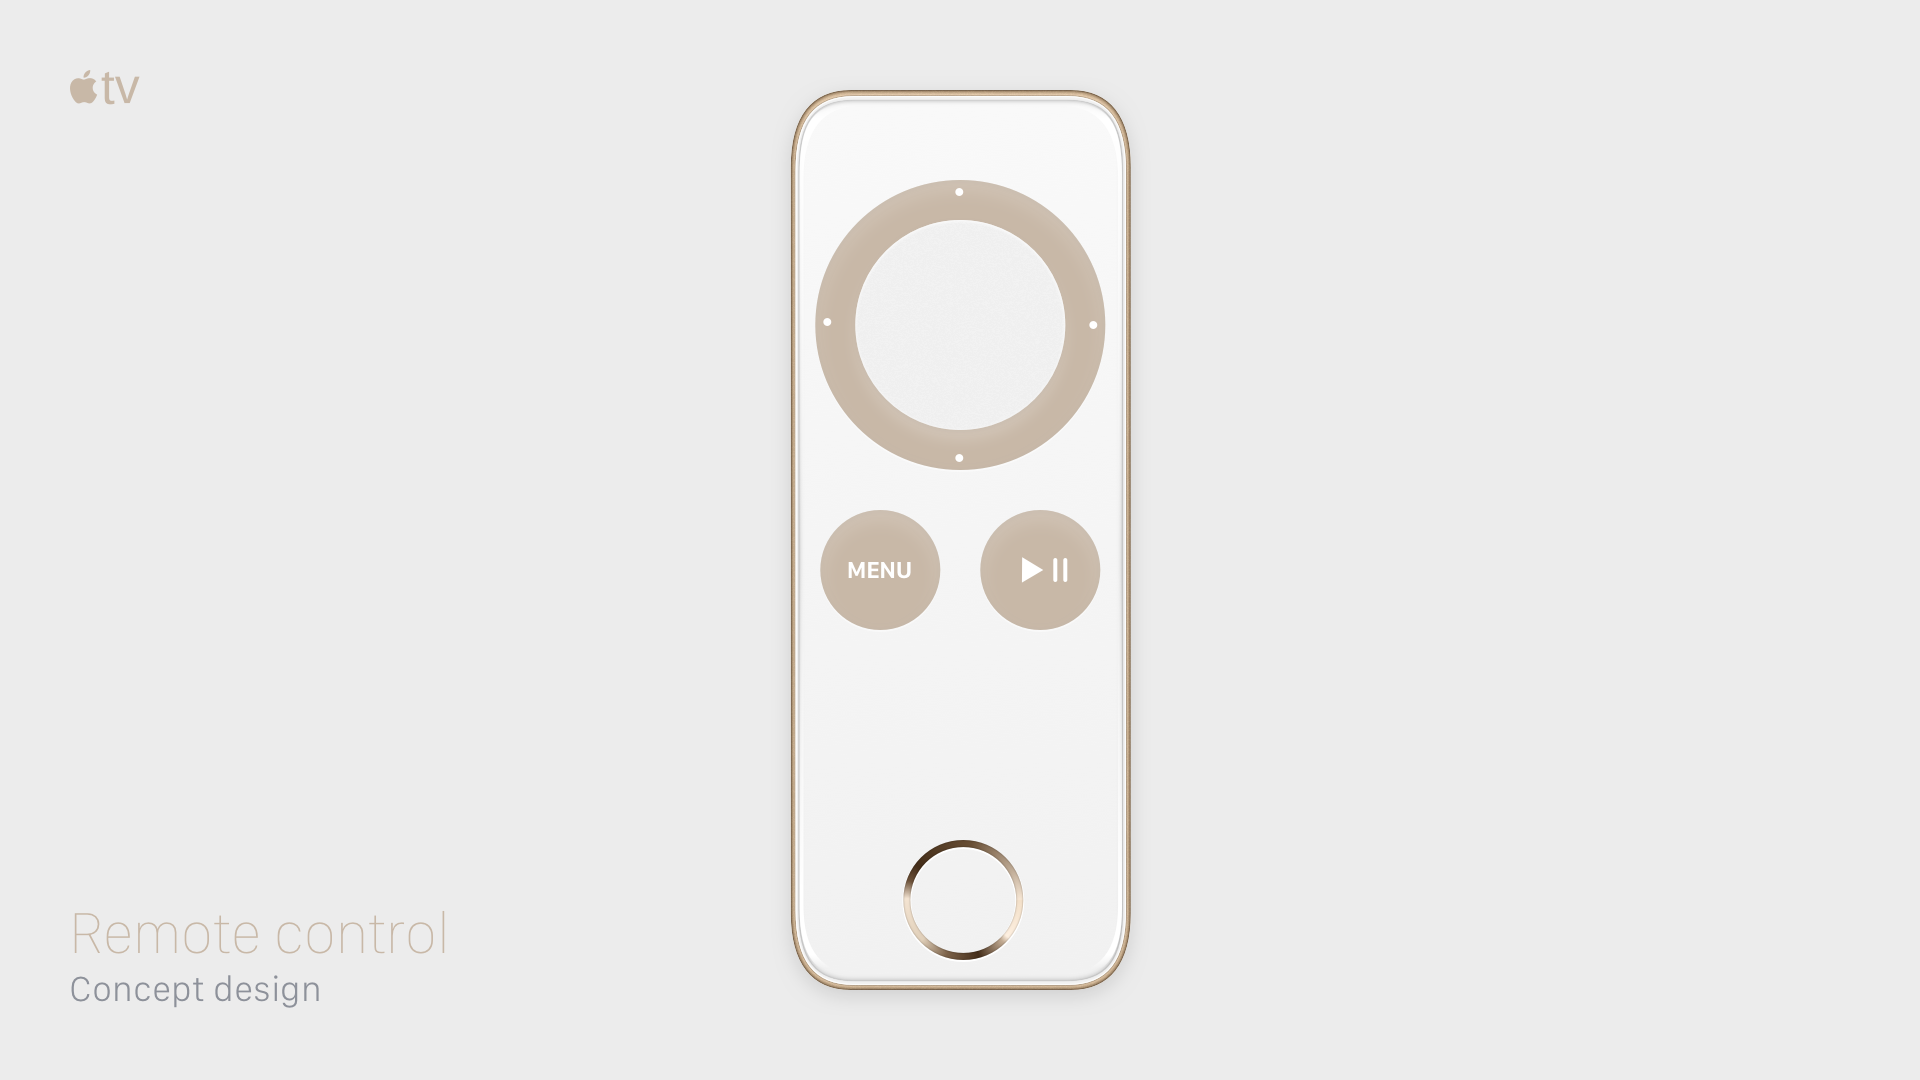 Remote Control Concept Copy Png By Dima Shvedun Remote Control Remote Nintendo Wii Controller